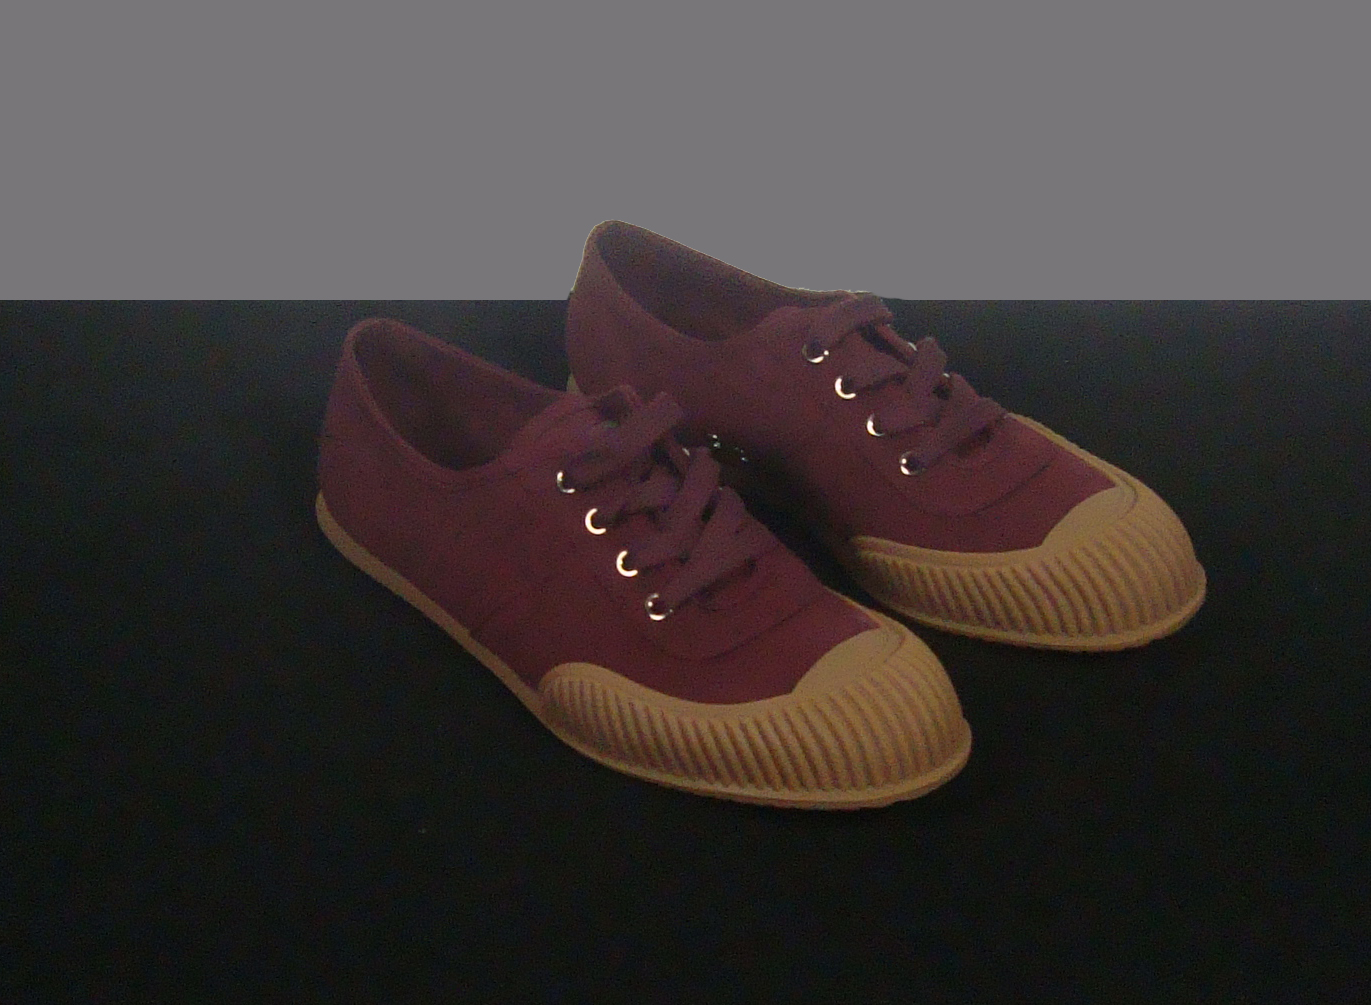 In 2013 Rachel donated Prada shoes (size 38).